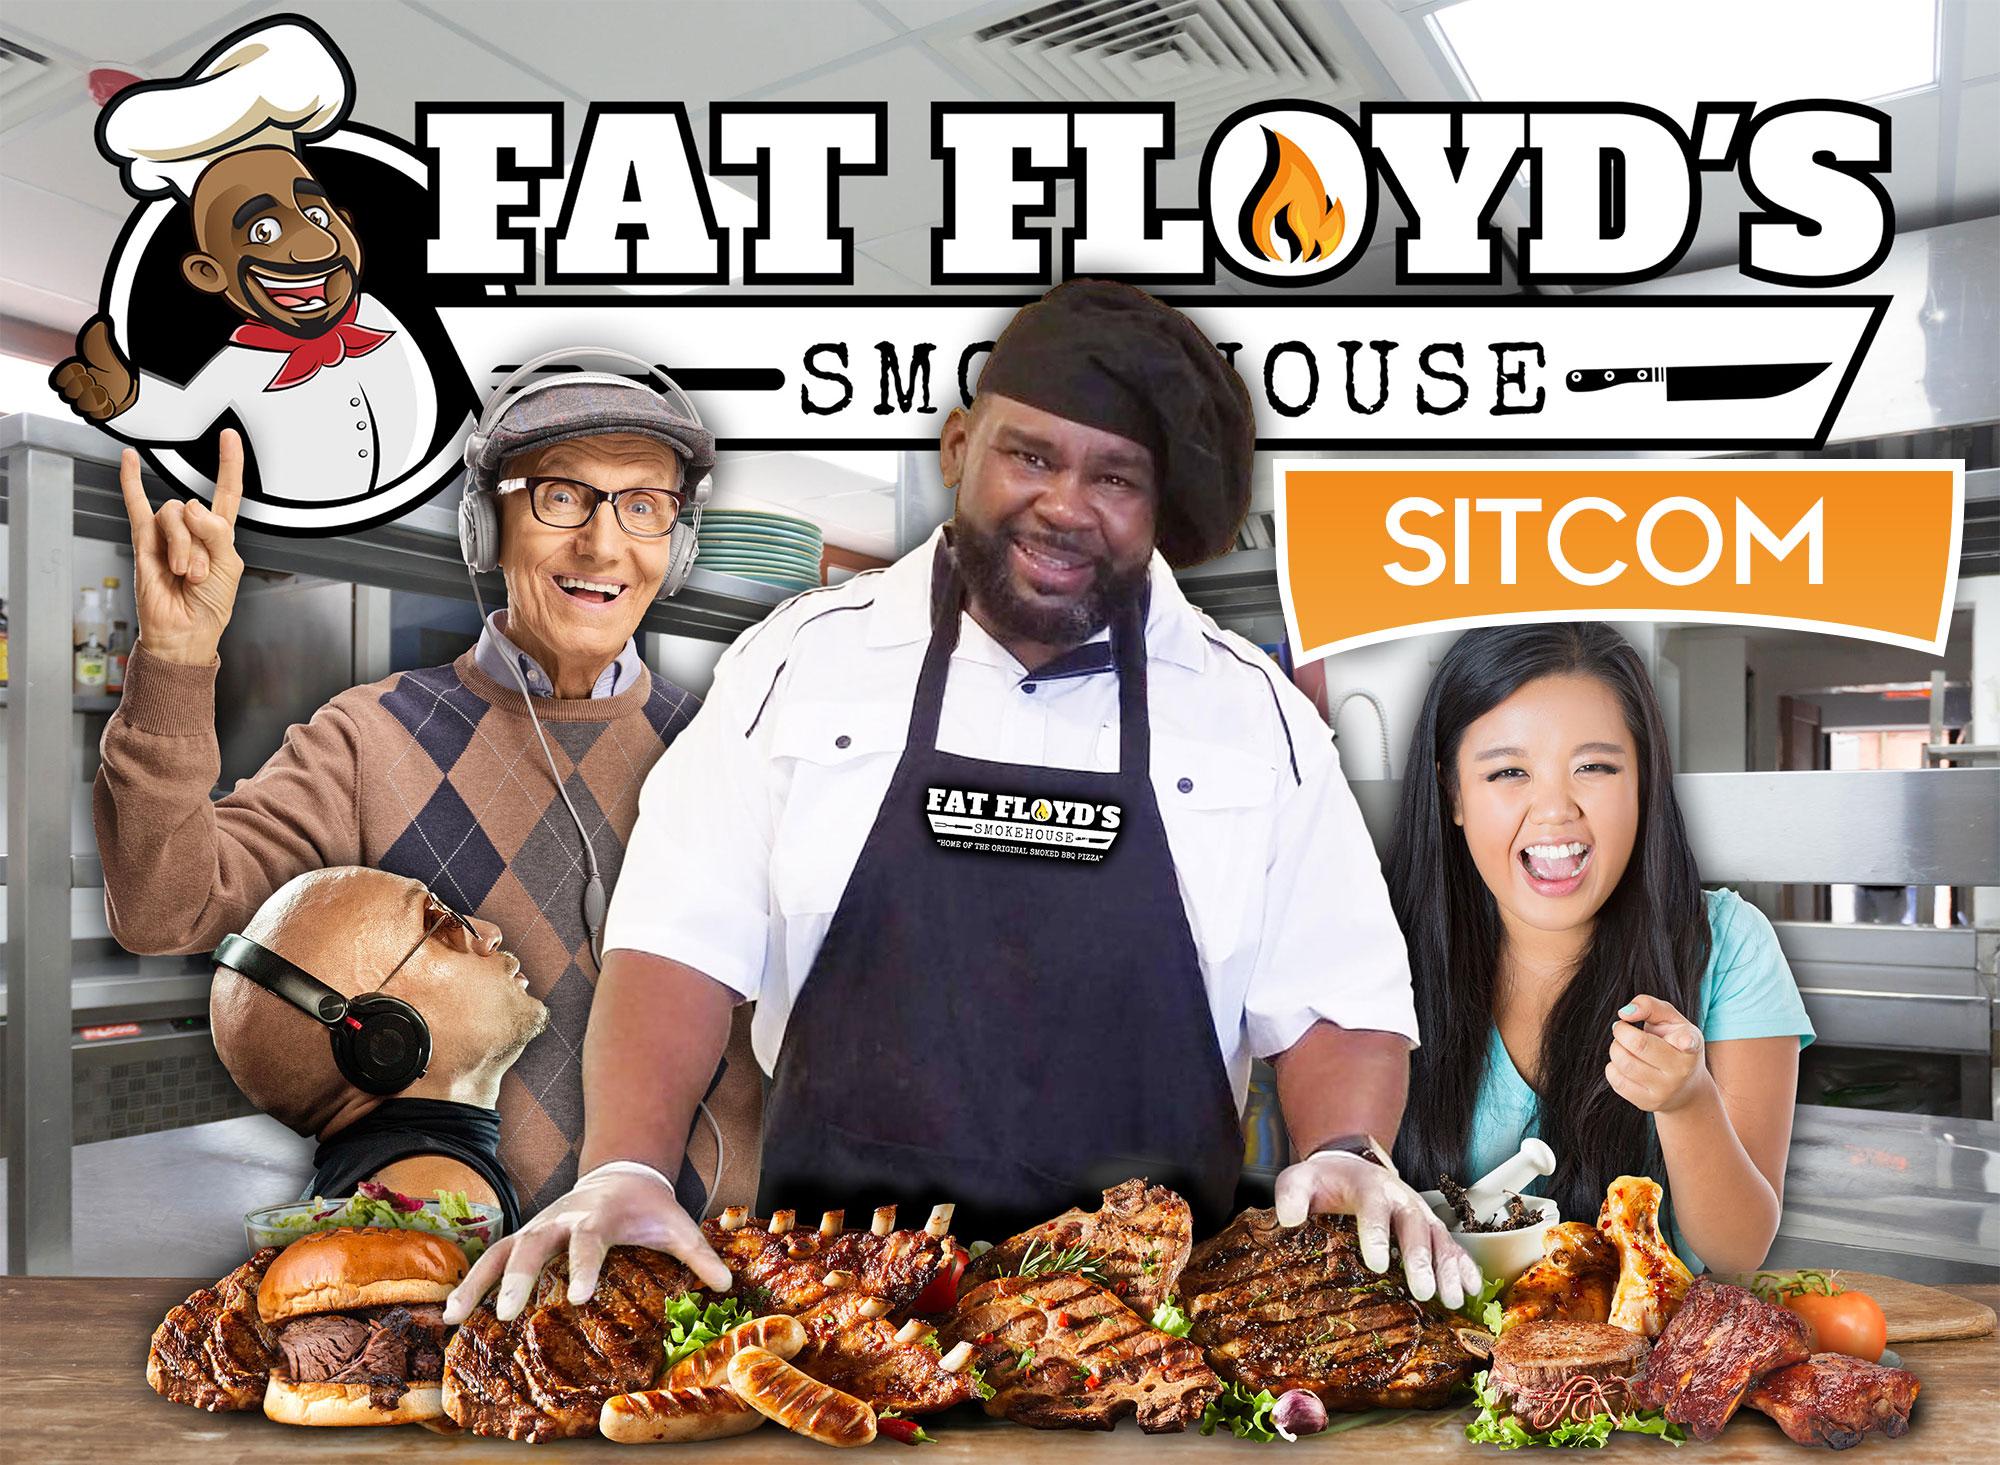 Fat Floyd's Sitcom